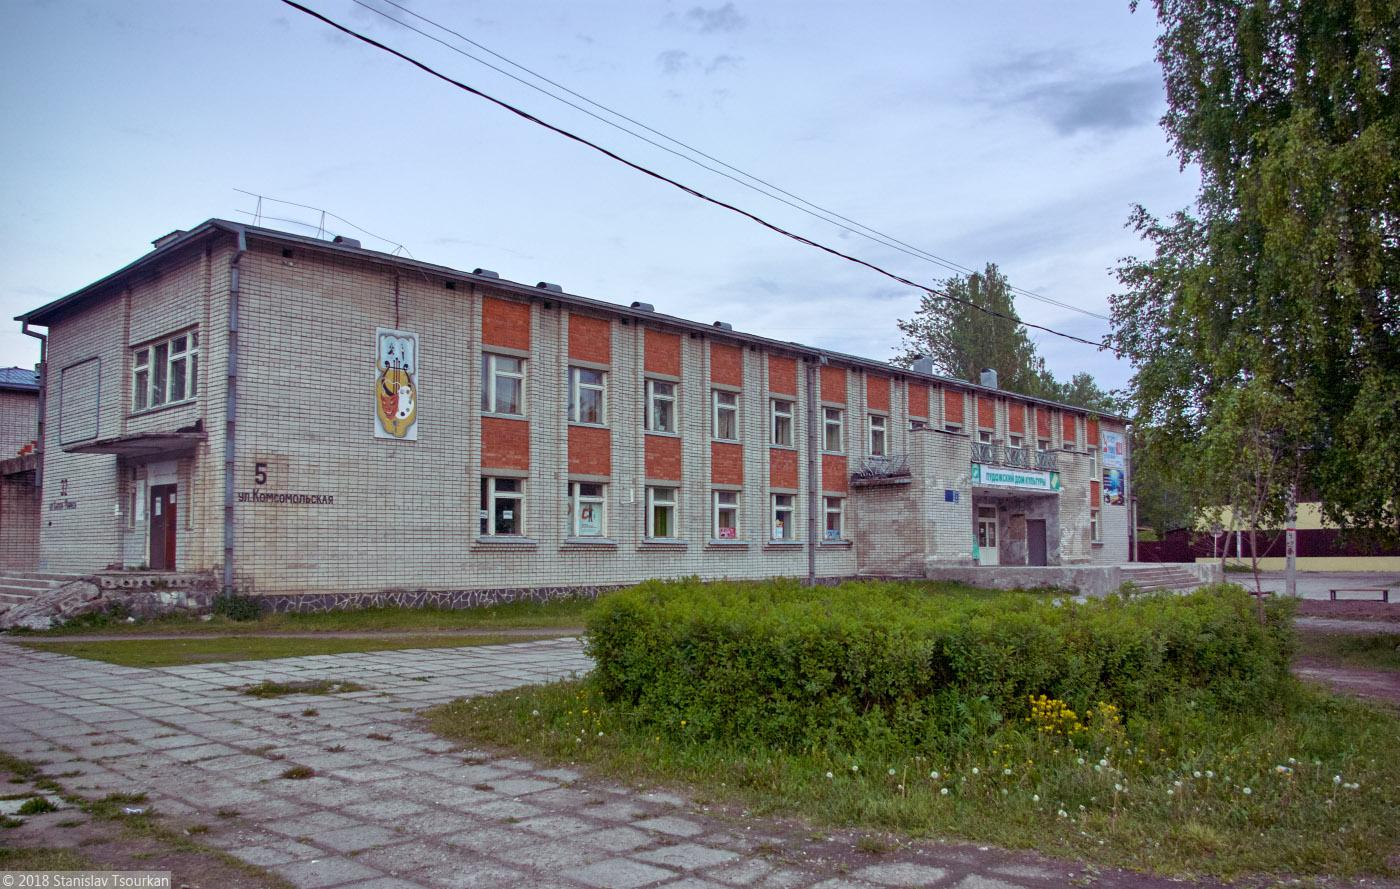 Пудож, Карелия, республика Карелия, дом культуры